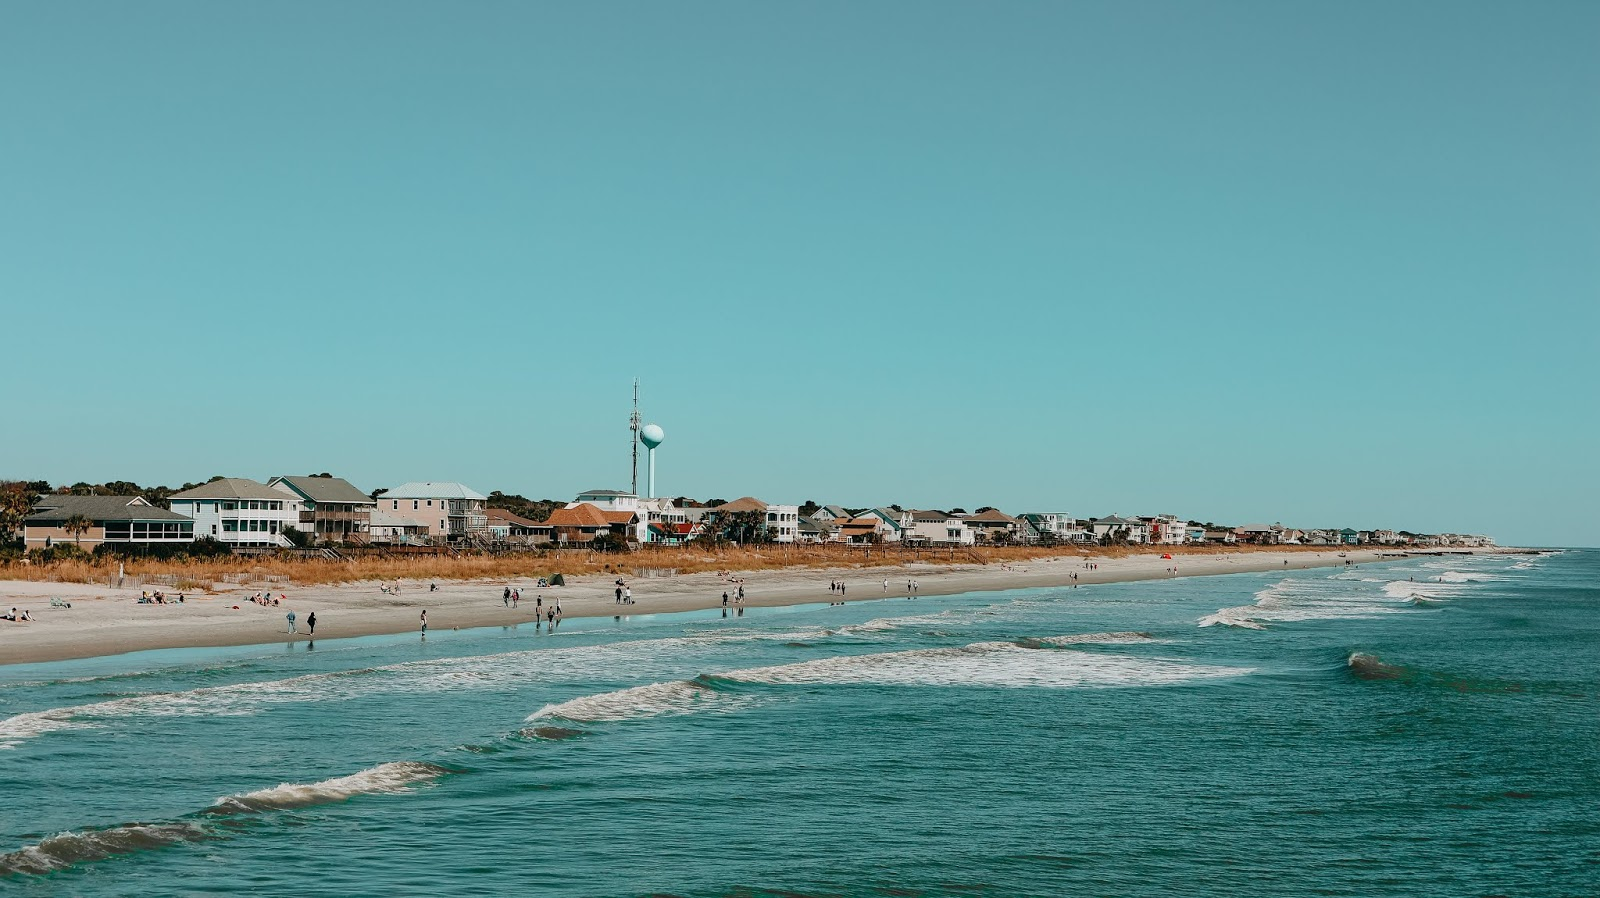 Falling In Love With Folly Beach, South Carolina - ItsHollieAnn